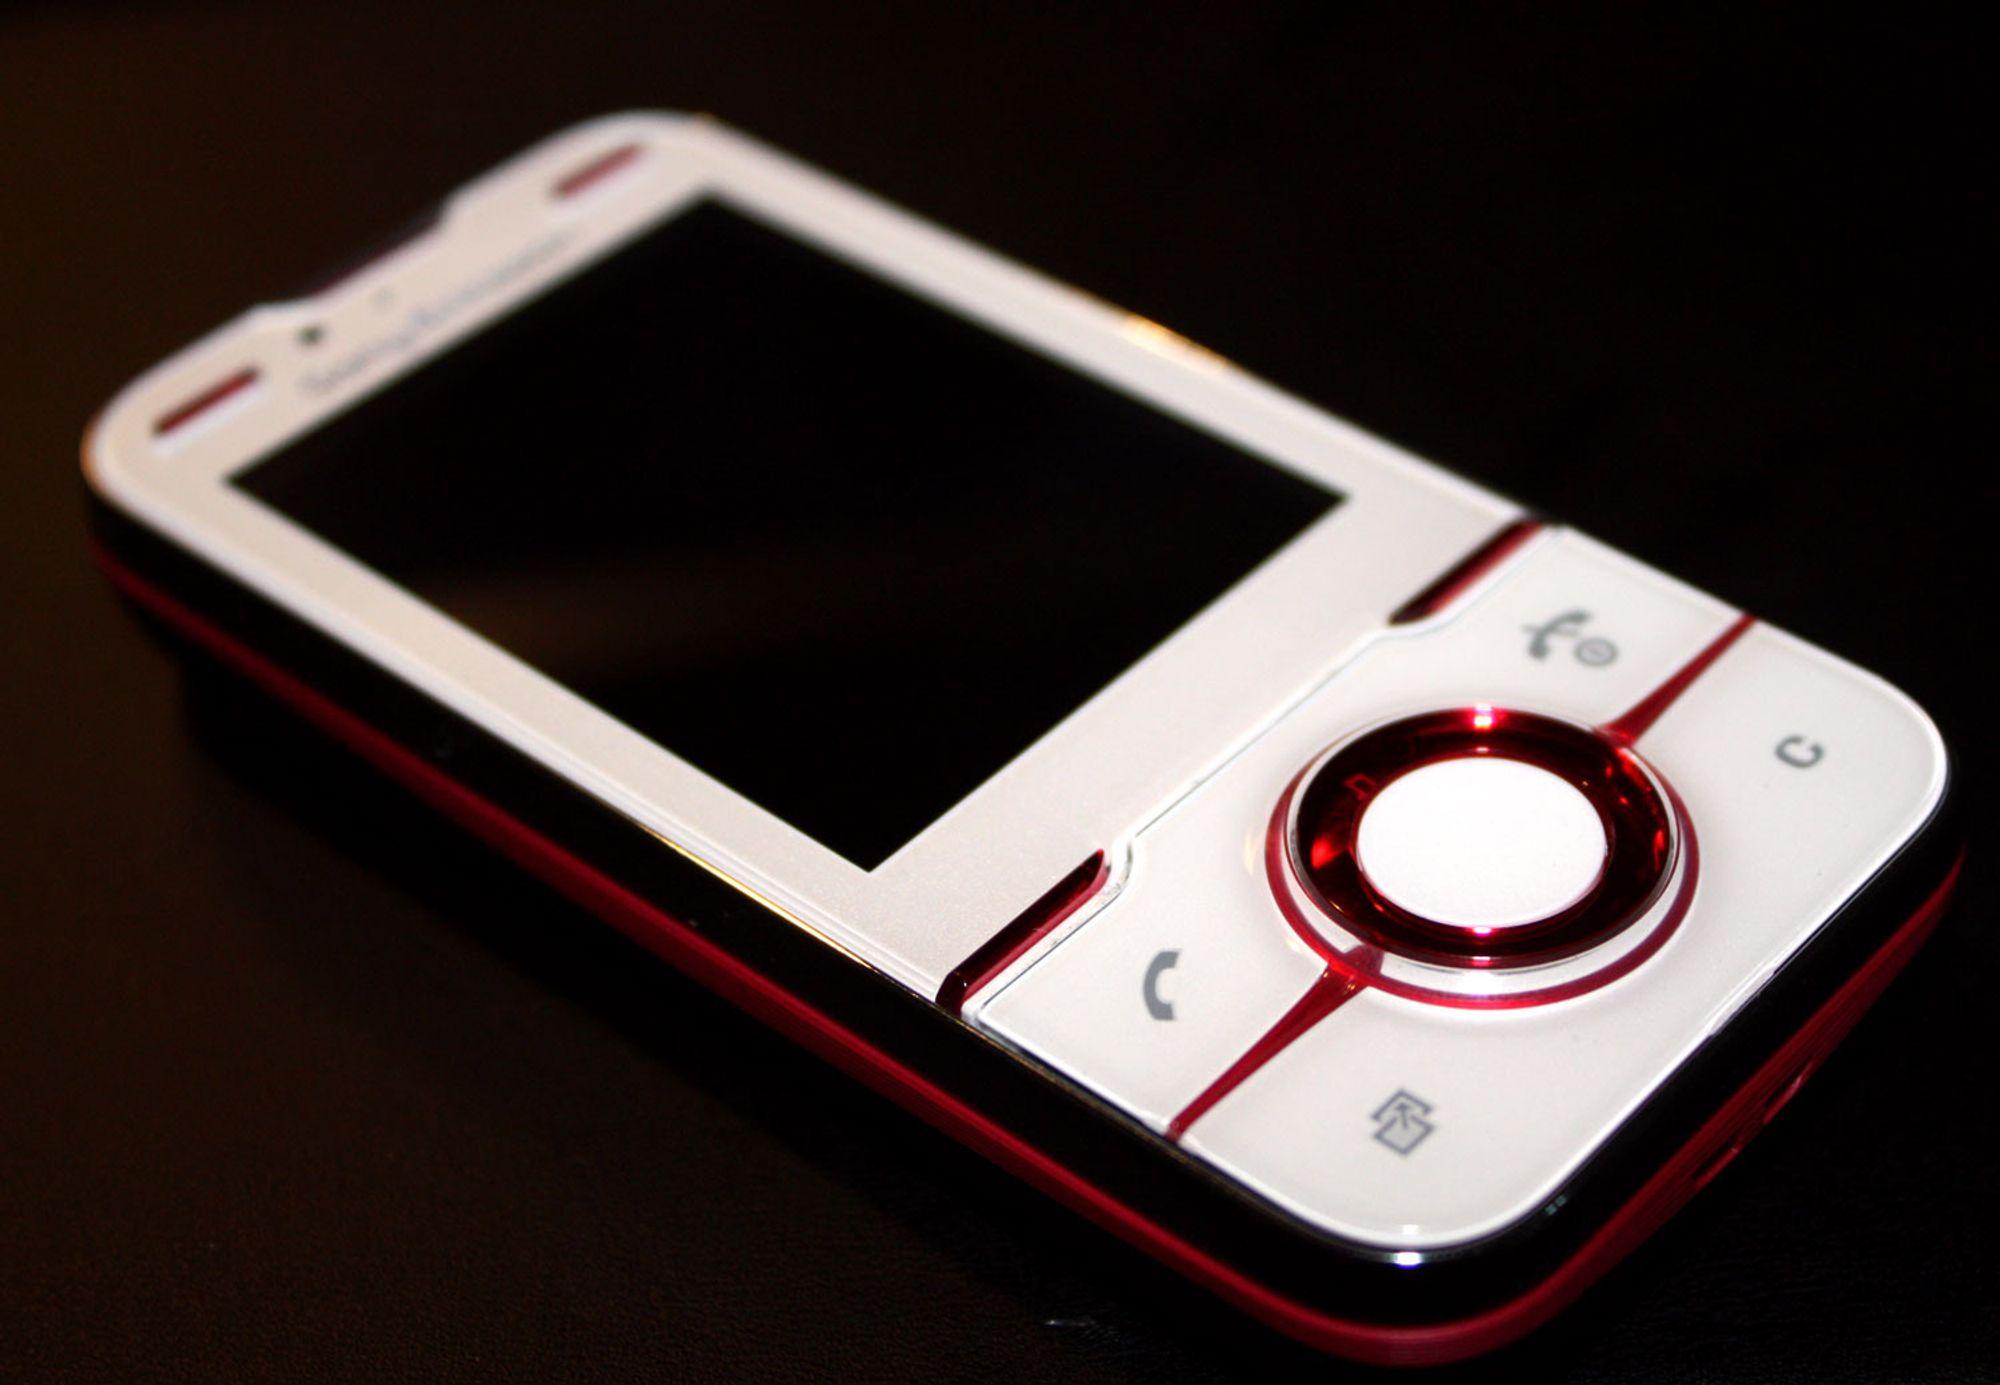 Sony Ericsson Yari in the Test